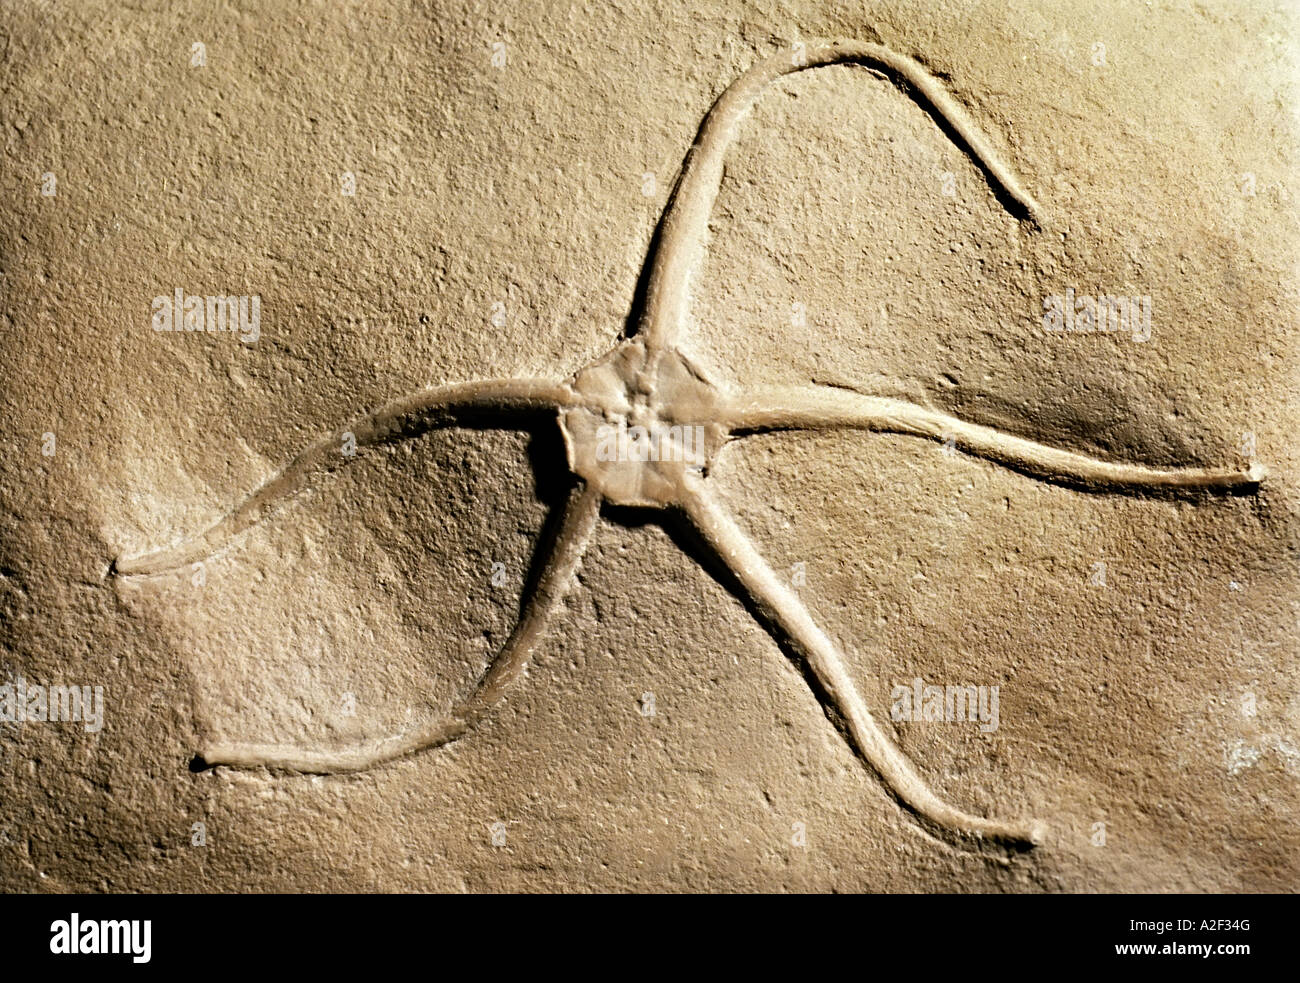 Brittlestar starfish fossil - Stock Image